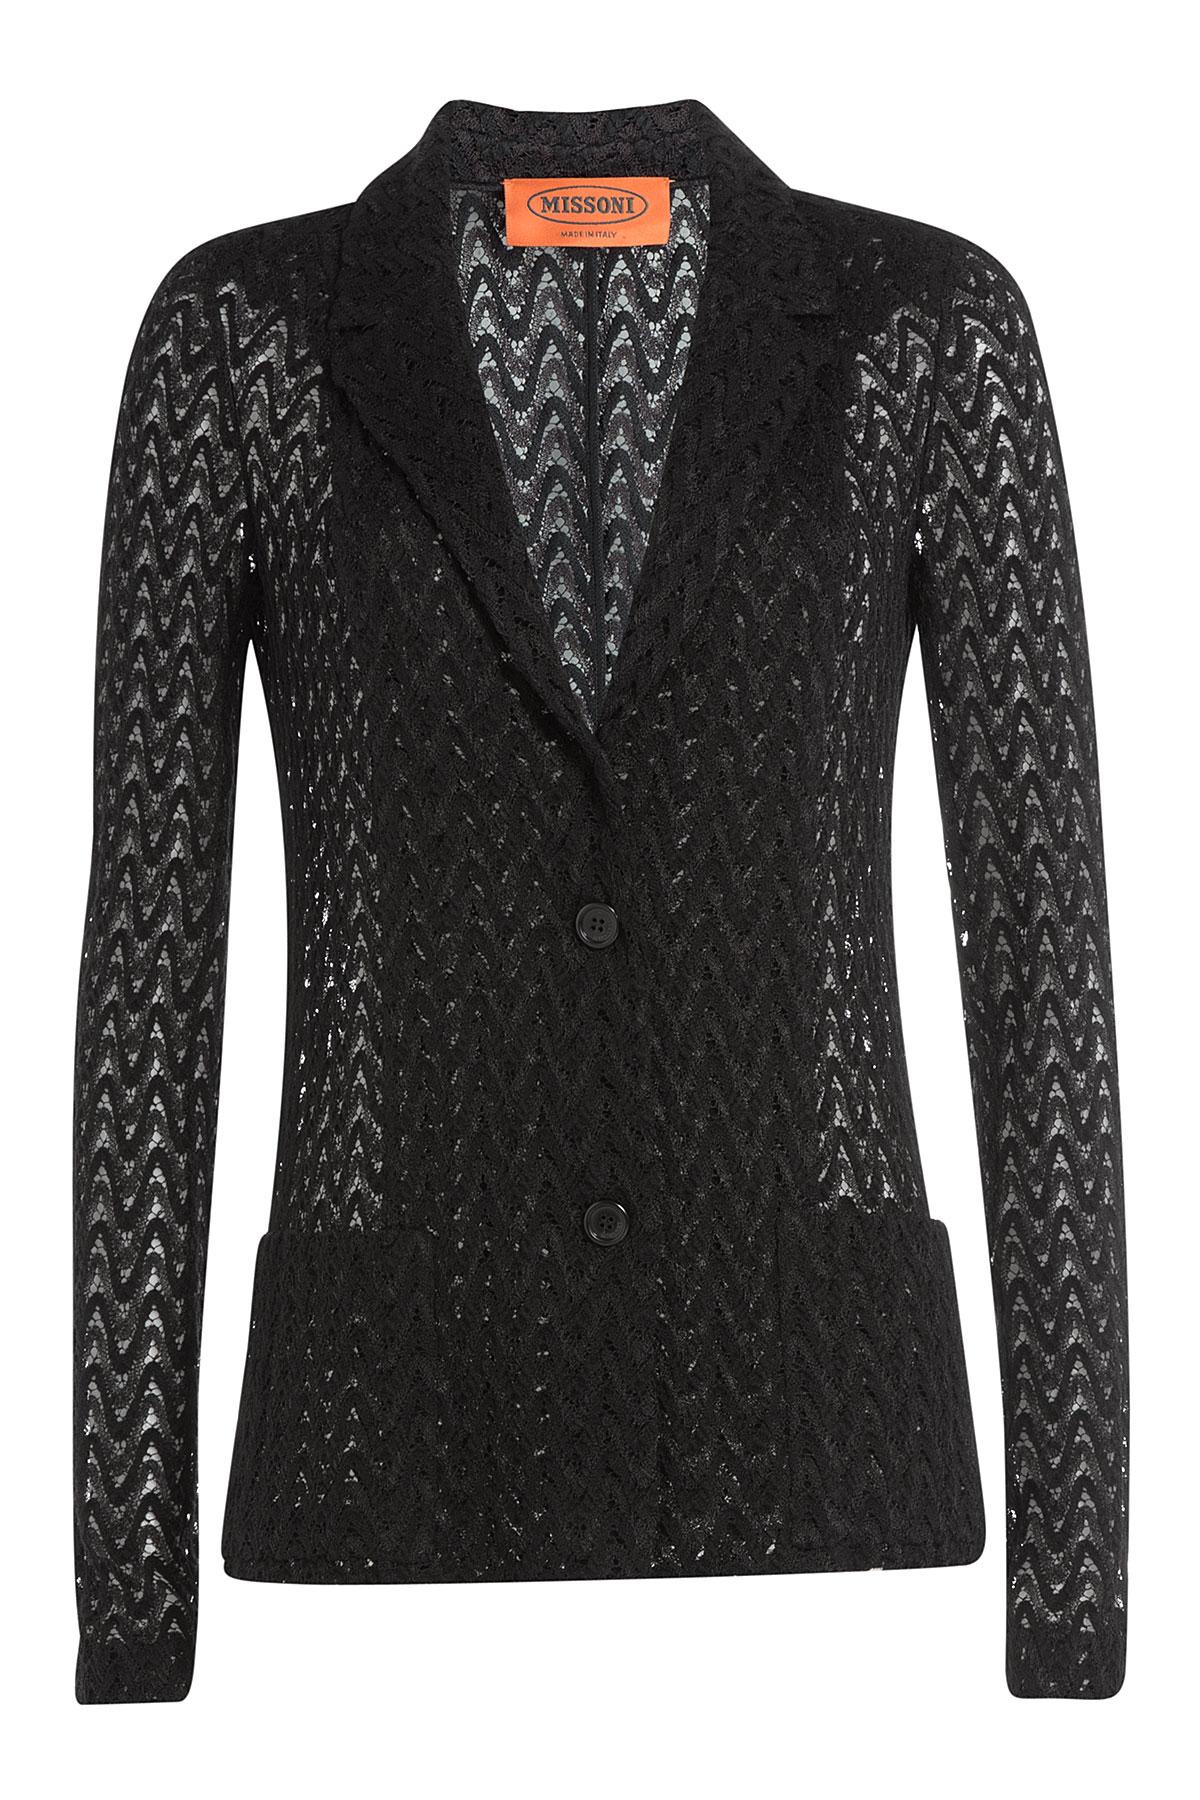 Black Crocheted Cardigan 11